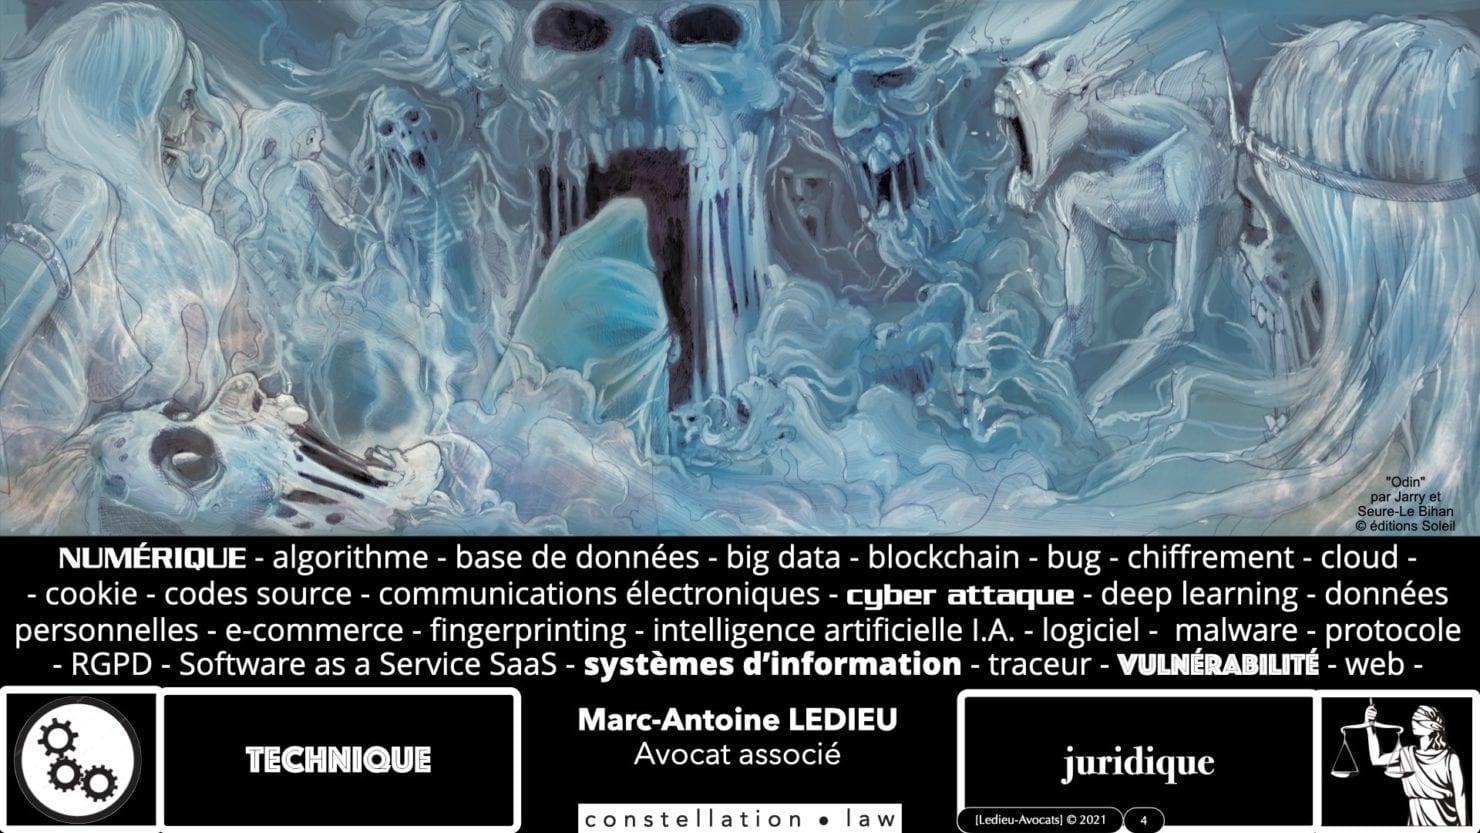 337 cyber sécurité #1 OIV OSE Critical Entities © Ledieu-avocat 15-06-2021.004